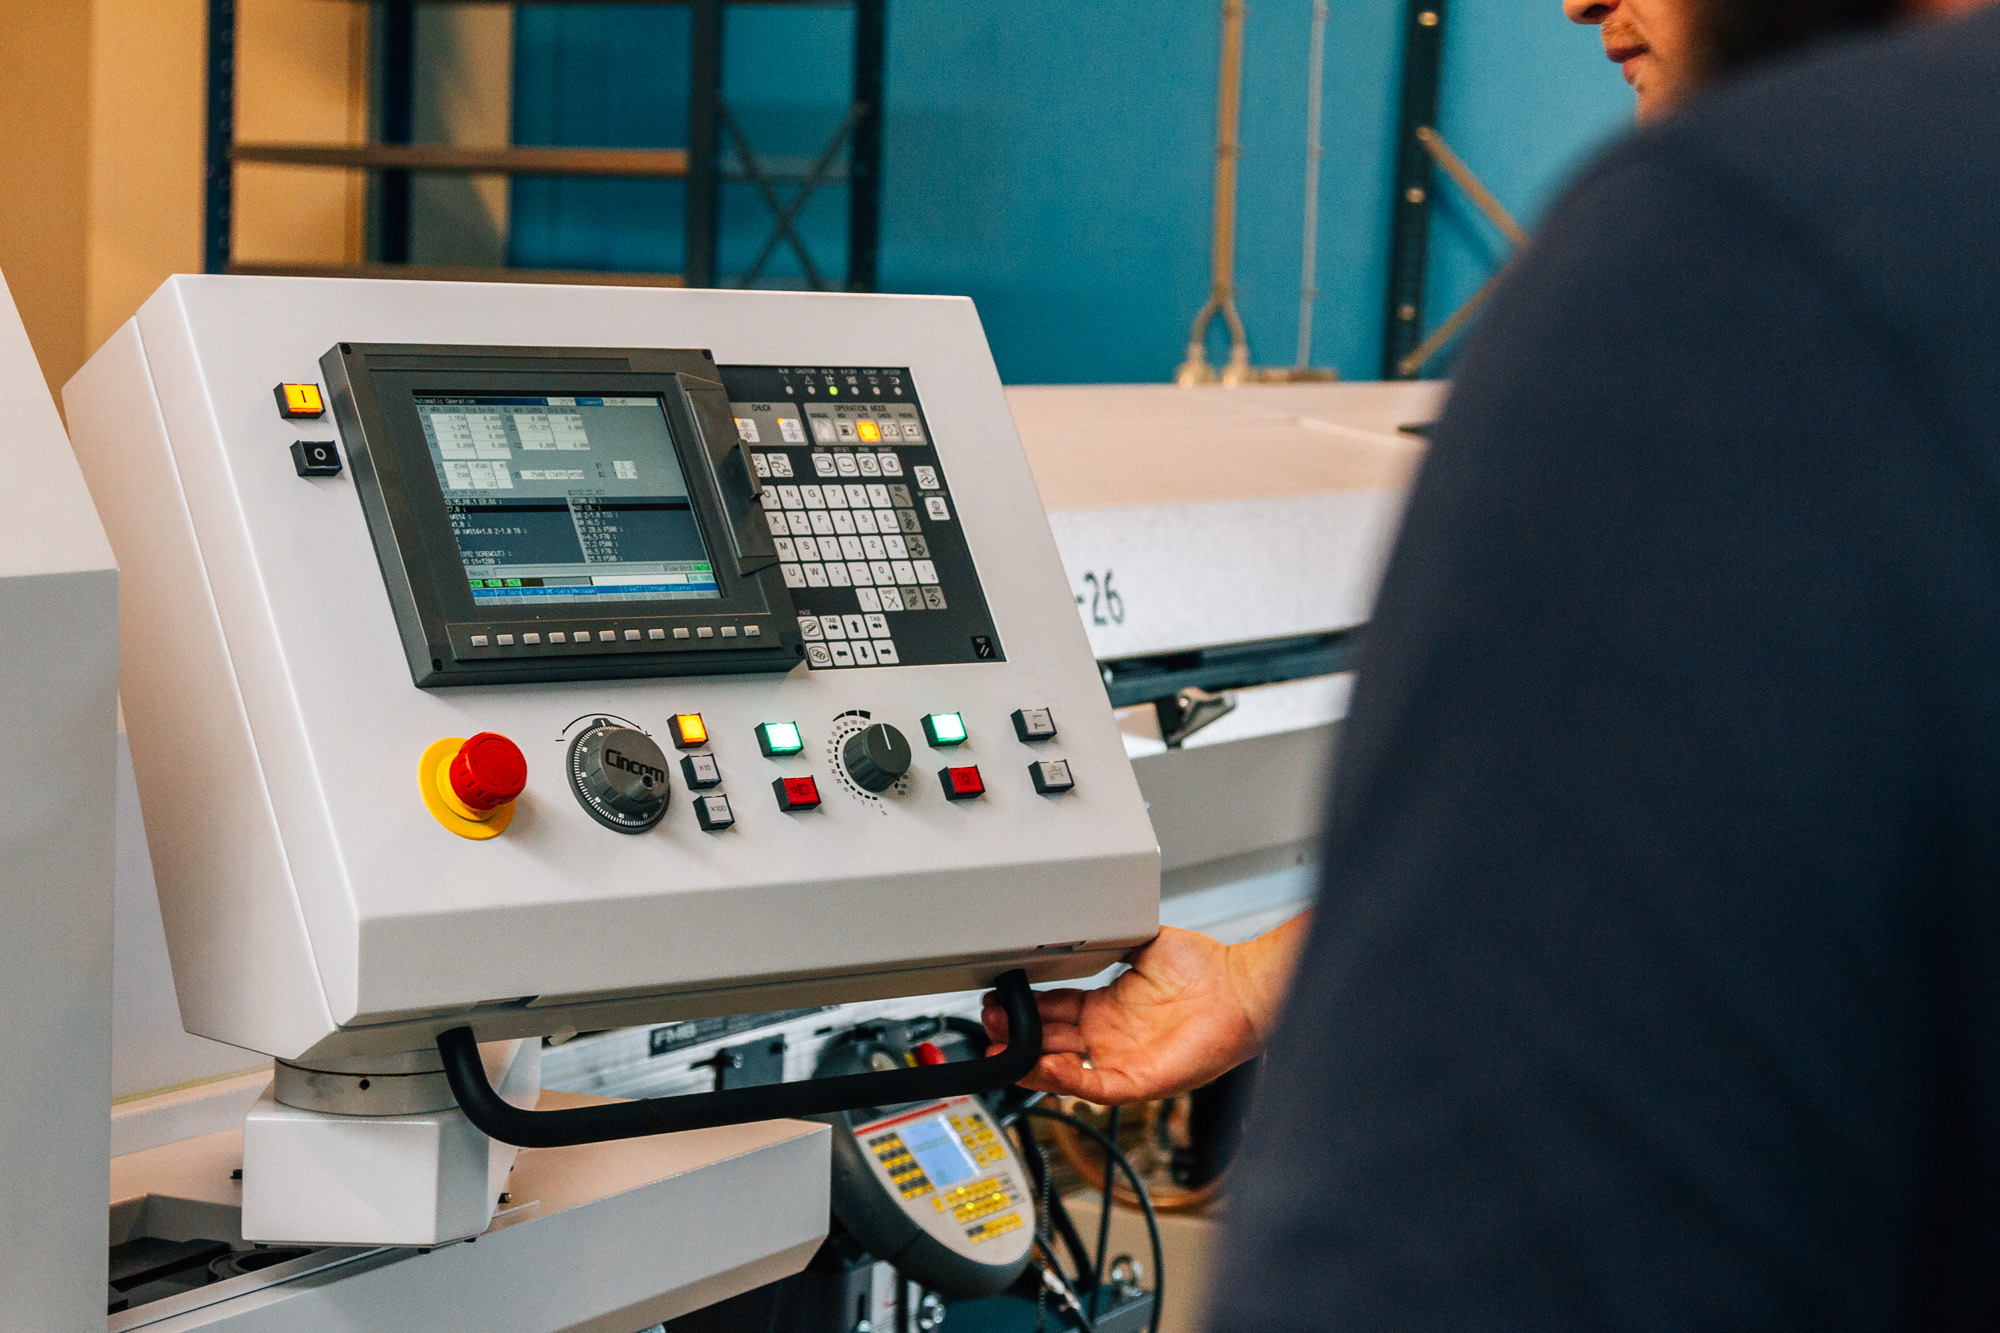 Ossi-Connectors-FJH-die-Steckverbinder-GmbH-5